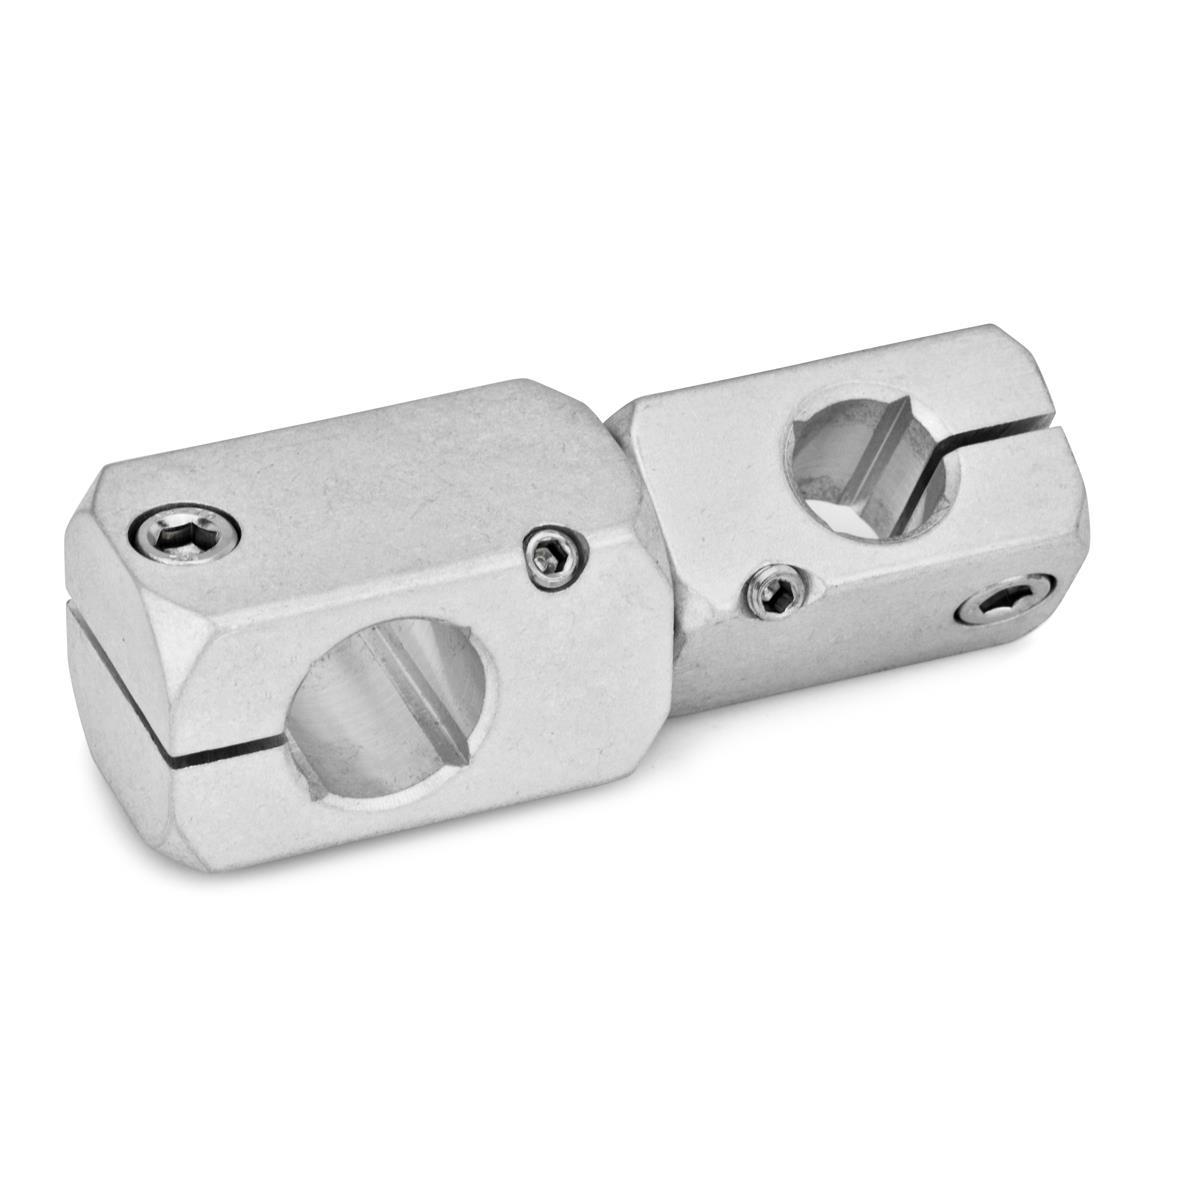 GN 475 Abrazaderas orientables de dos ejes, aluminio Acabado: MT - mate, mecanizado fino